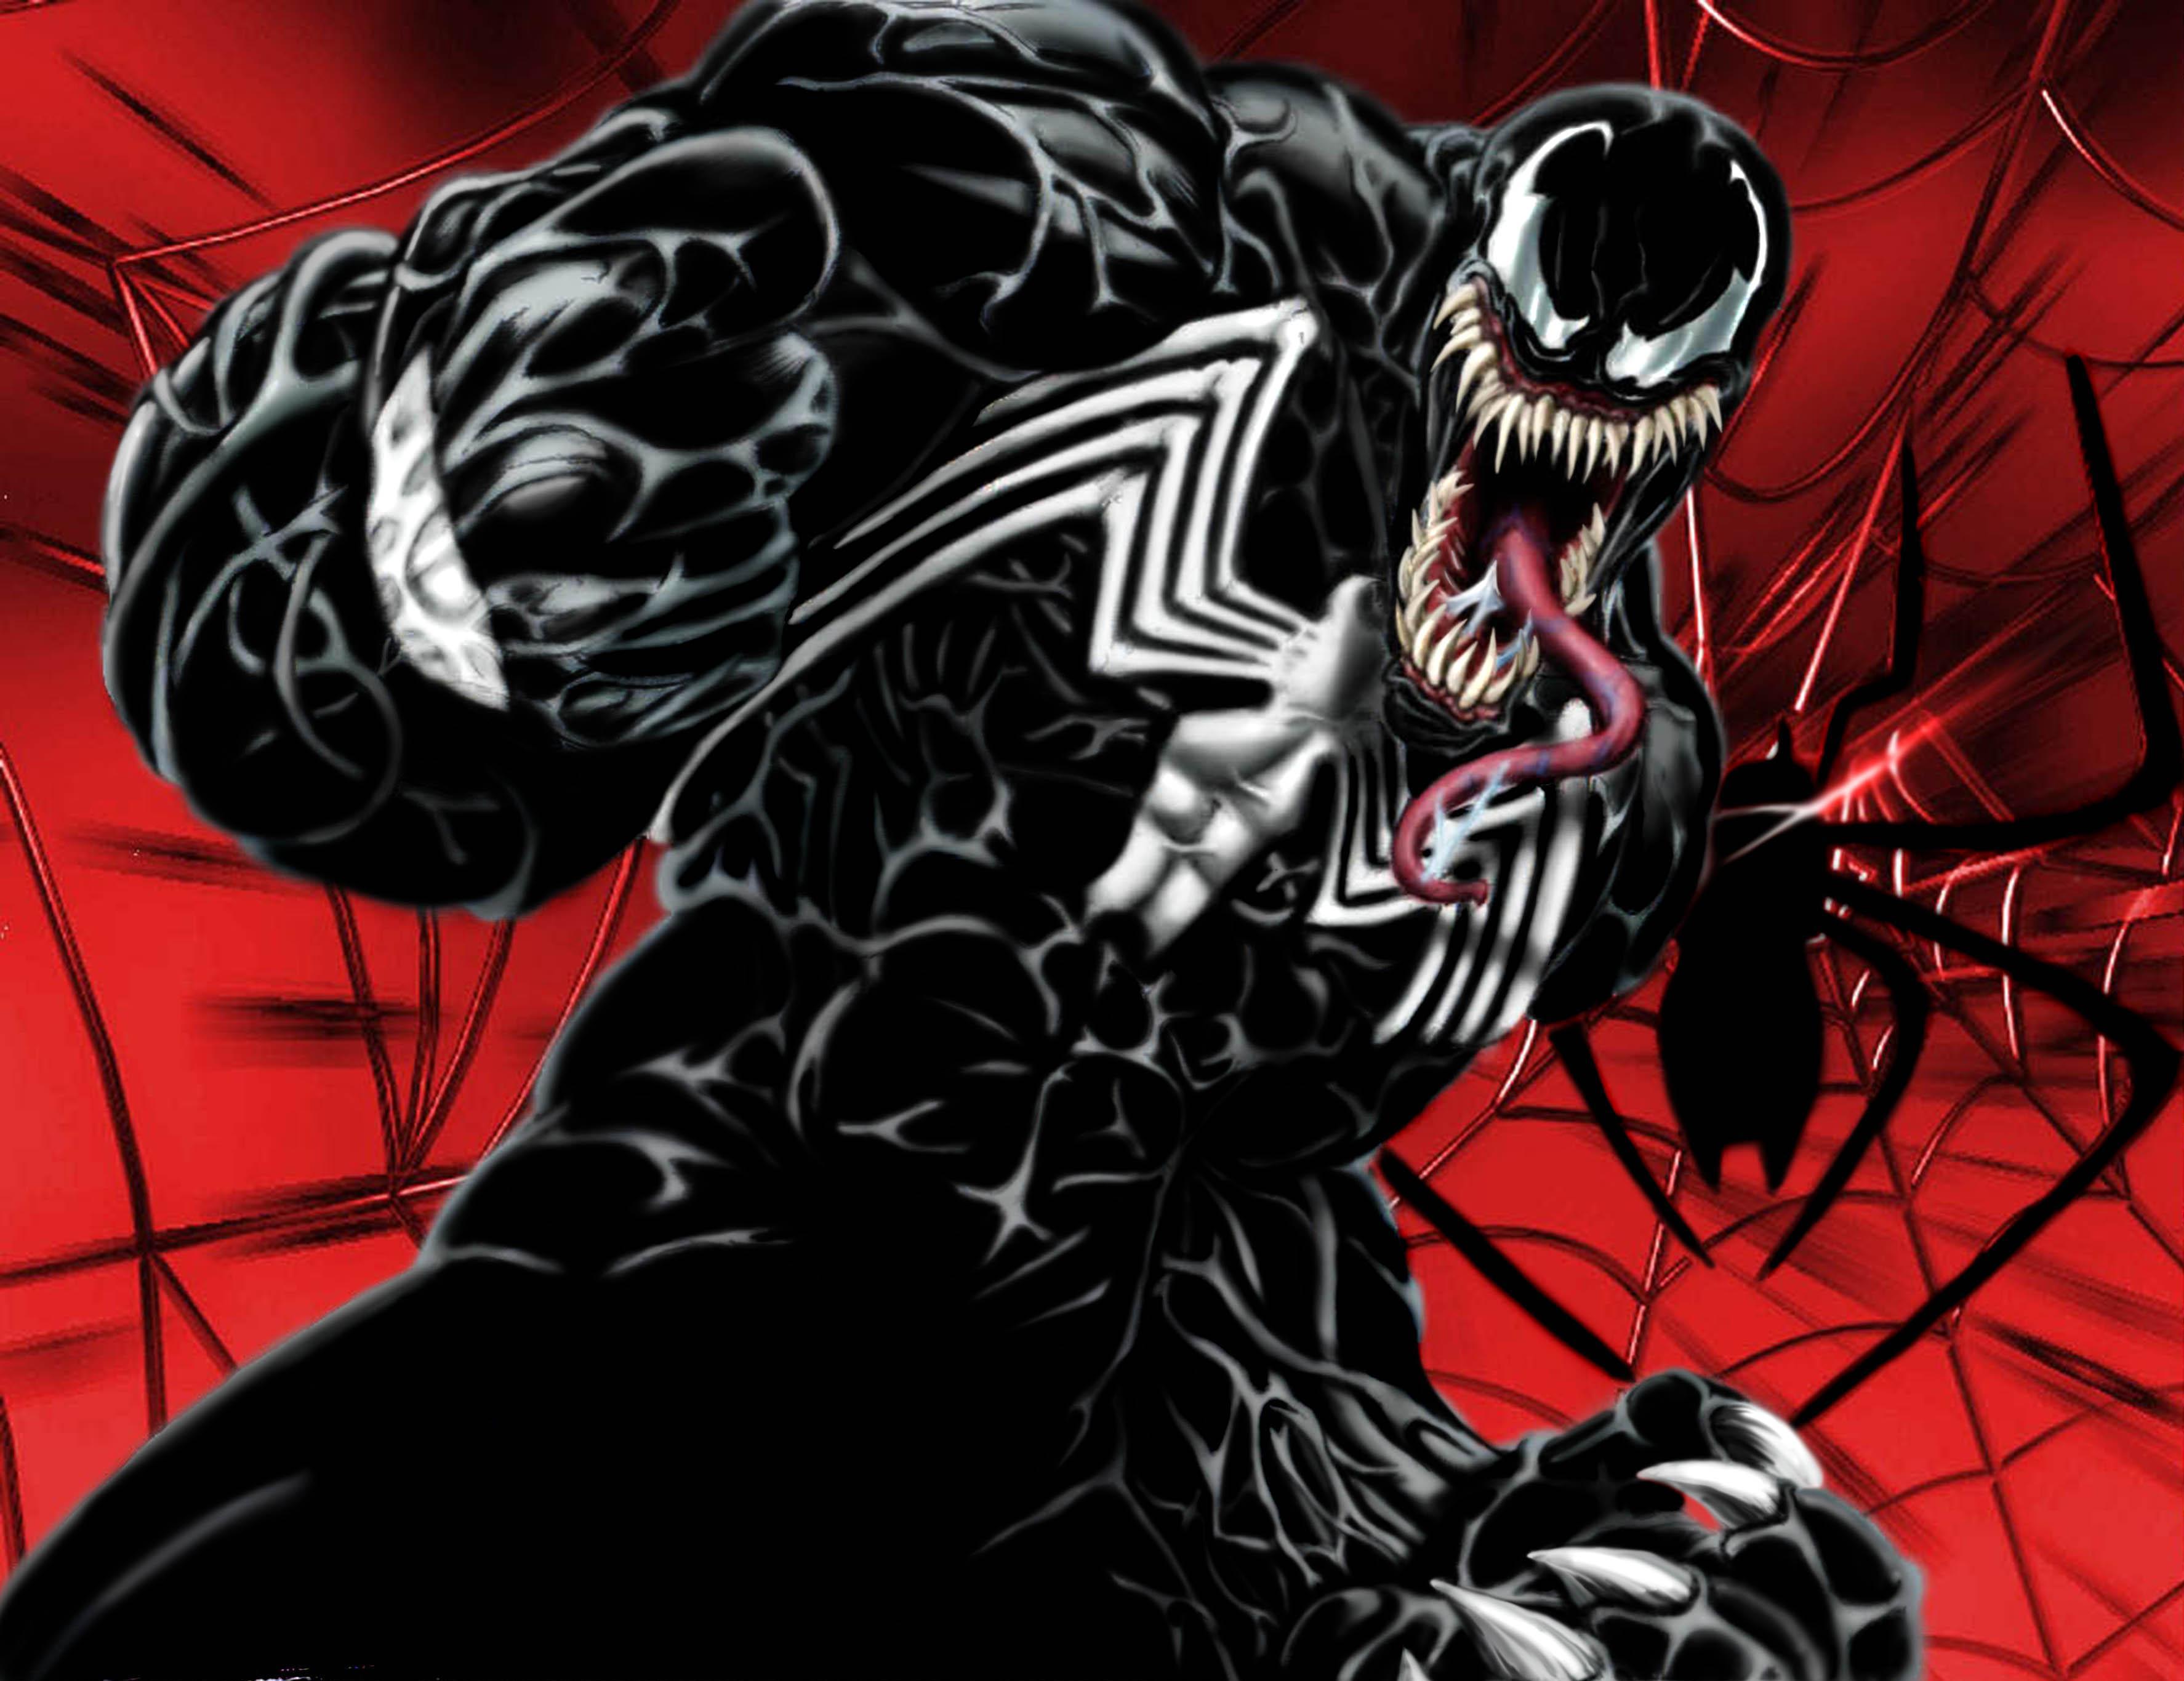 Spider Man Villains Images Spidey Vs Carnage And Venom Wallpaper